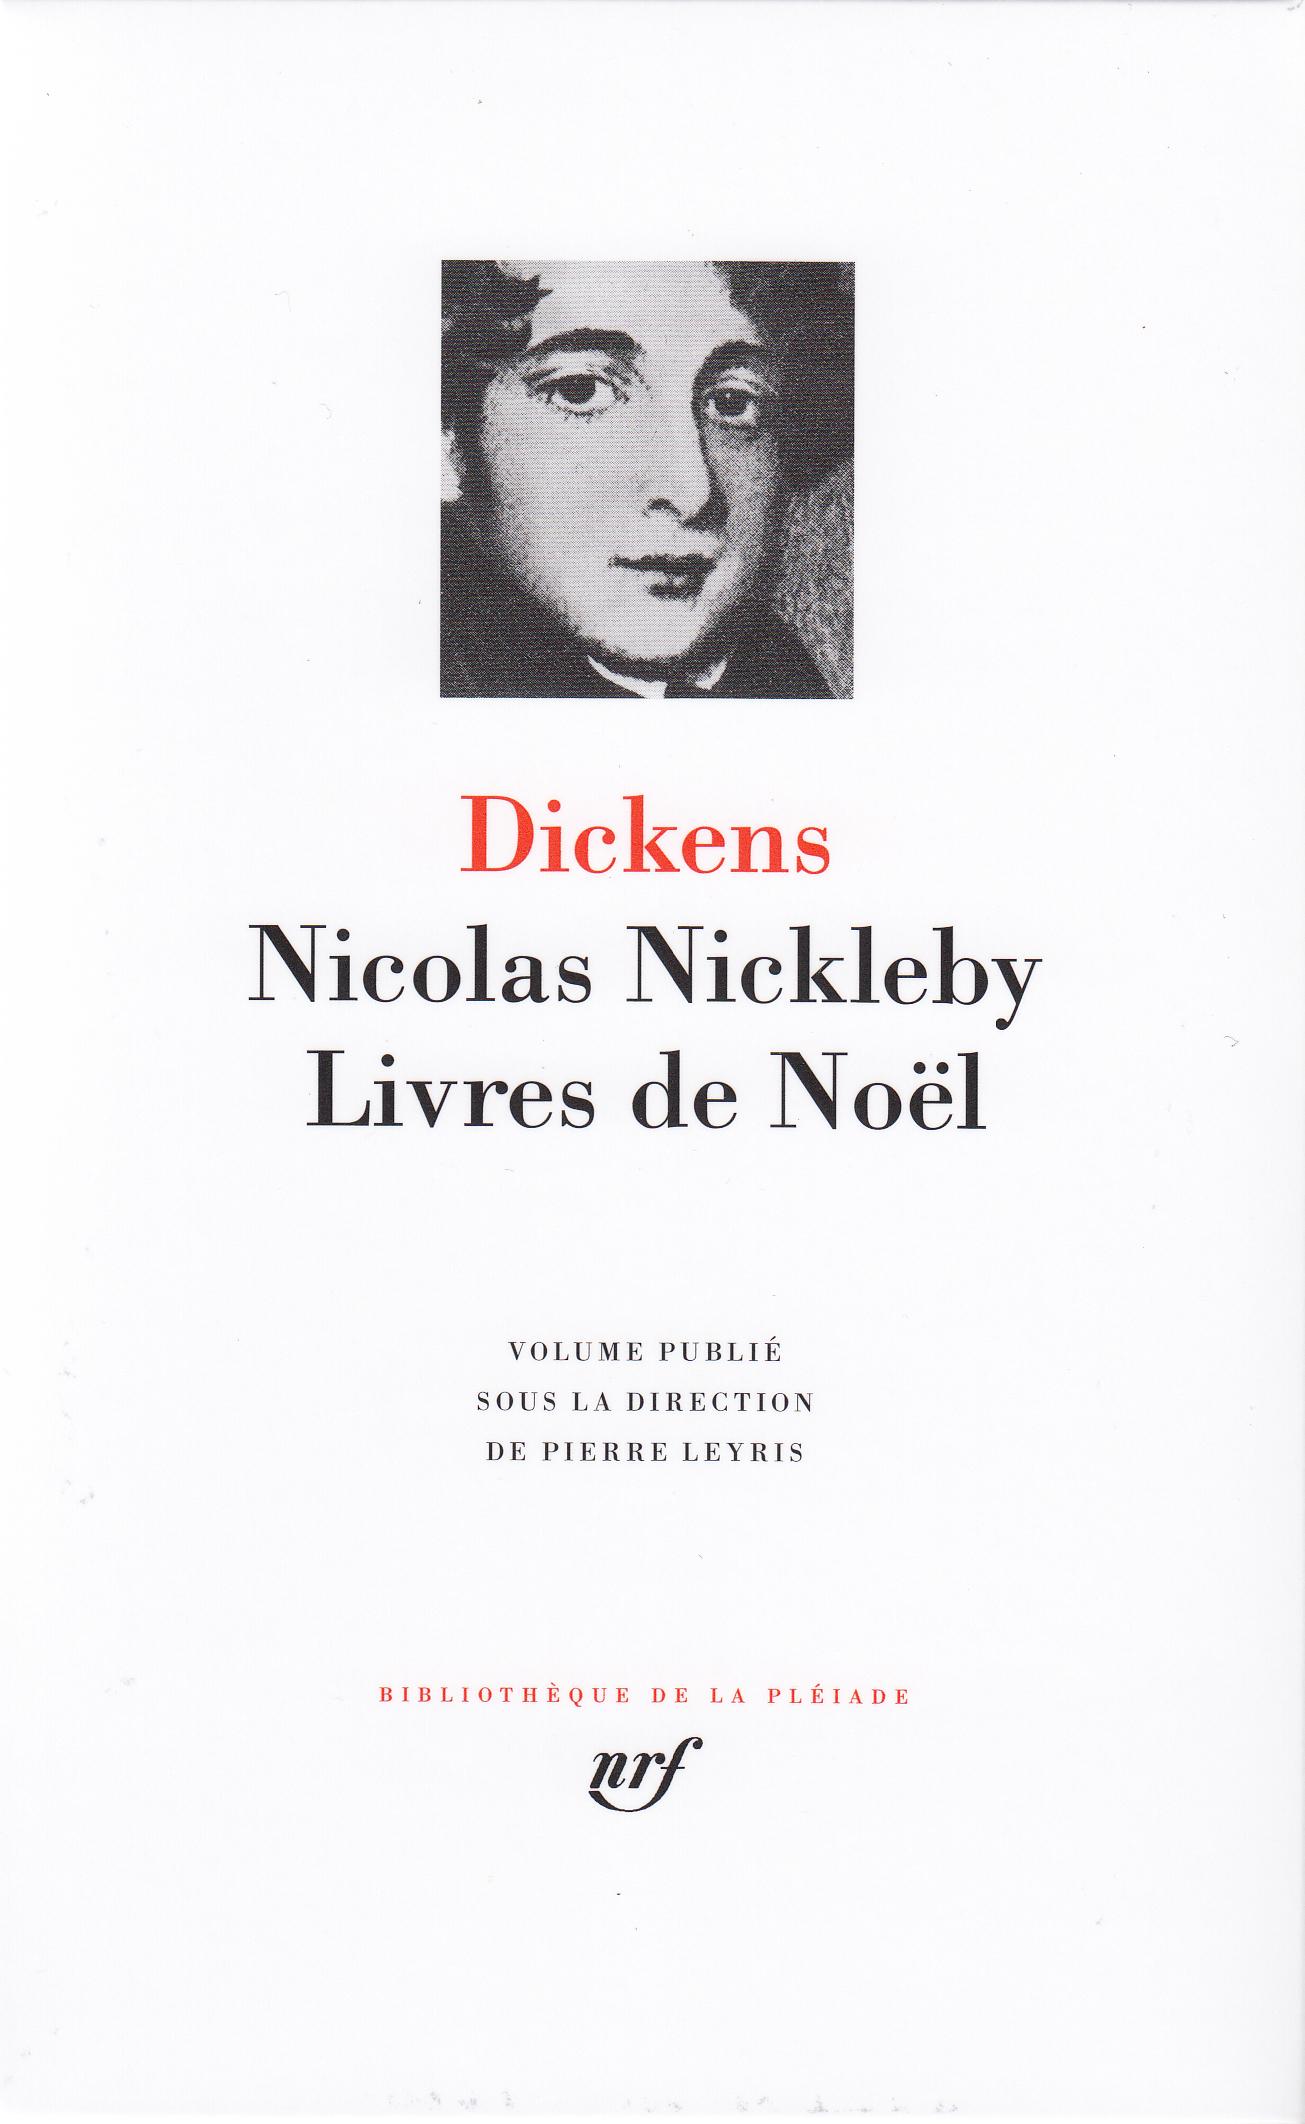 NICOLAS NICKLEBY - LIVRES DE NOEL